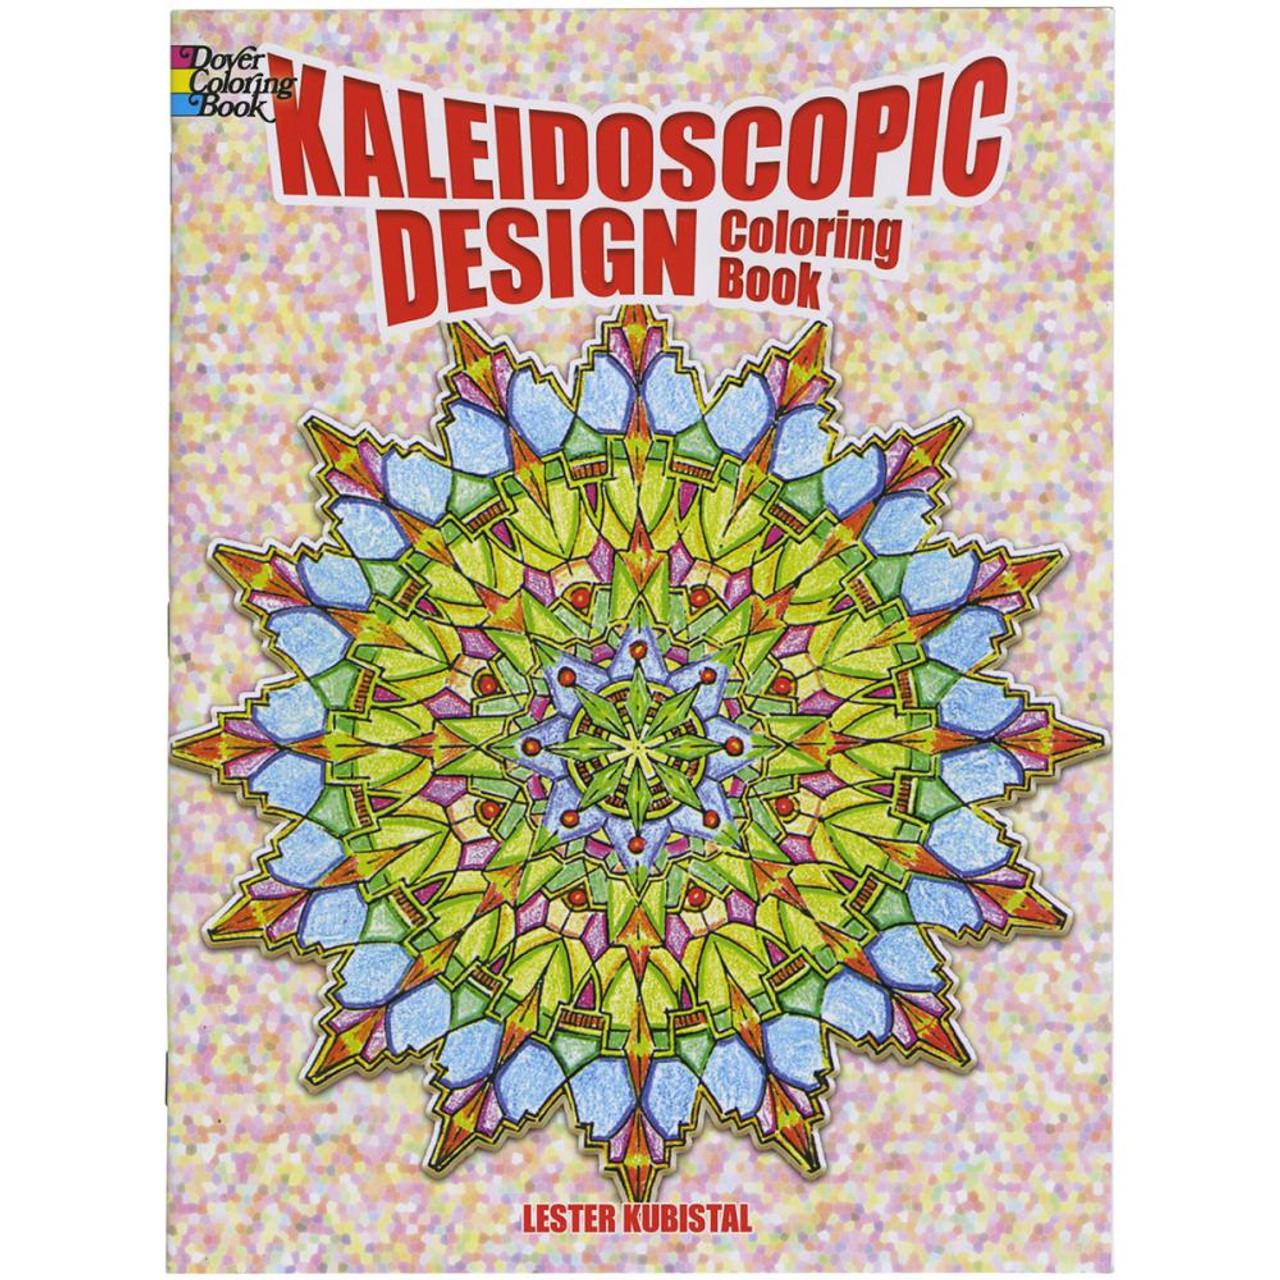 dover publications coloring book kaleidoscopic design - Dover Publishing Coloring Books